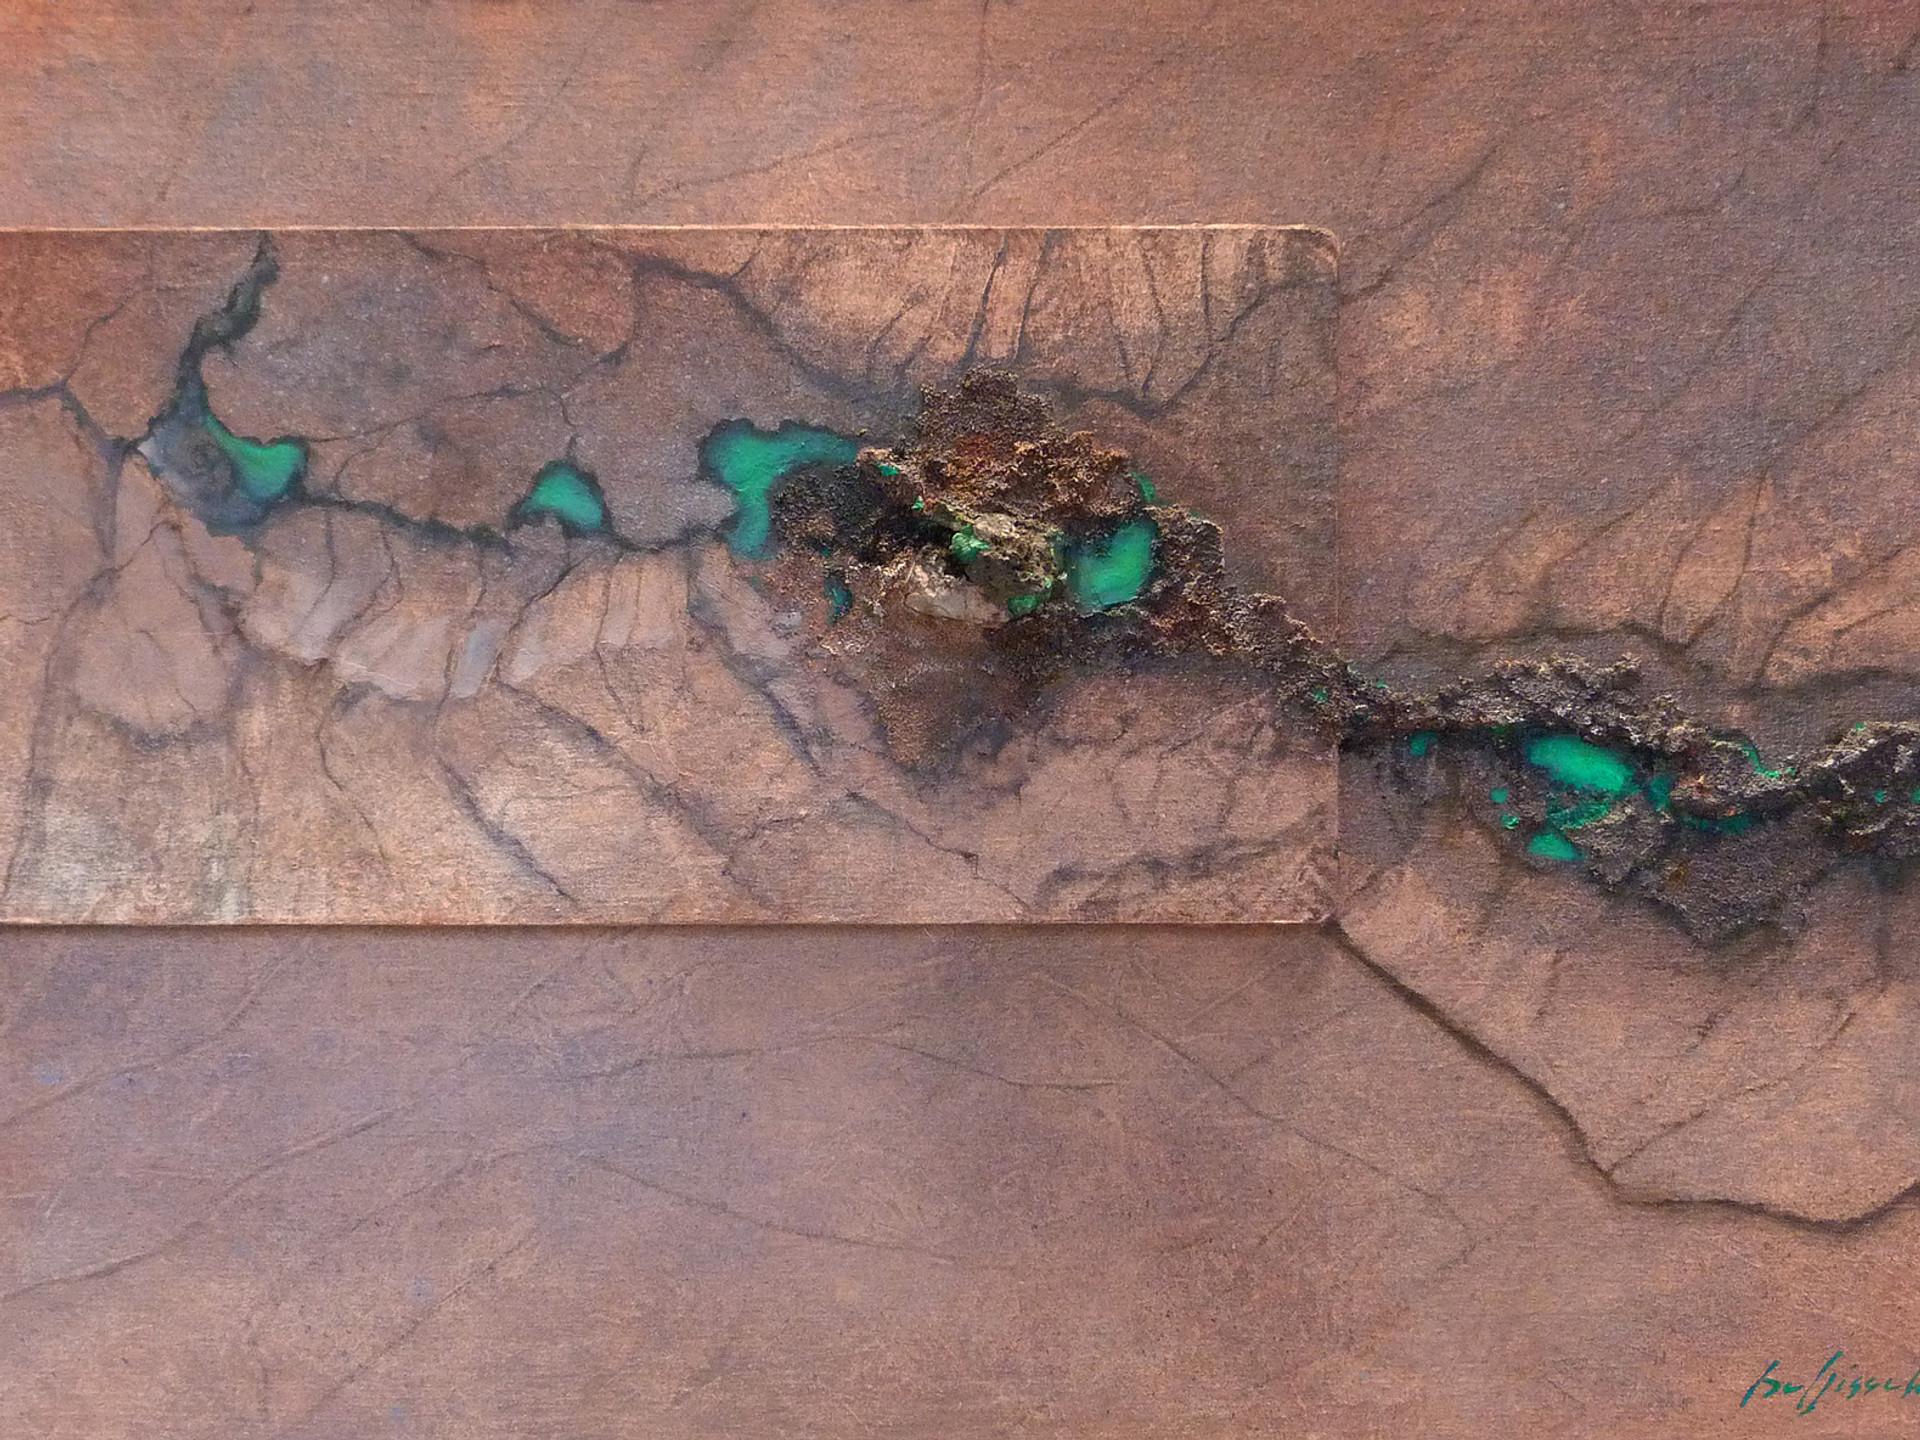 Reine du Shaba' MALACHITE(2) 100x60 cm (mineral - oilpainting - mixed media)